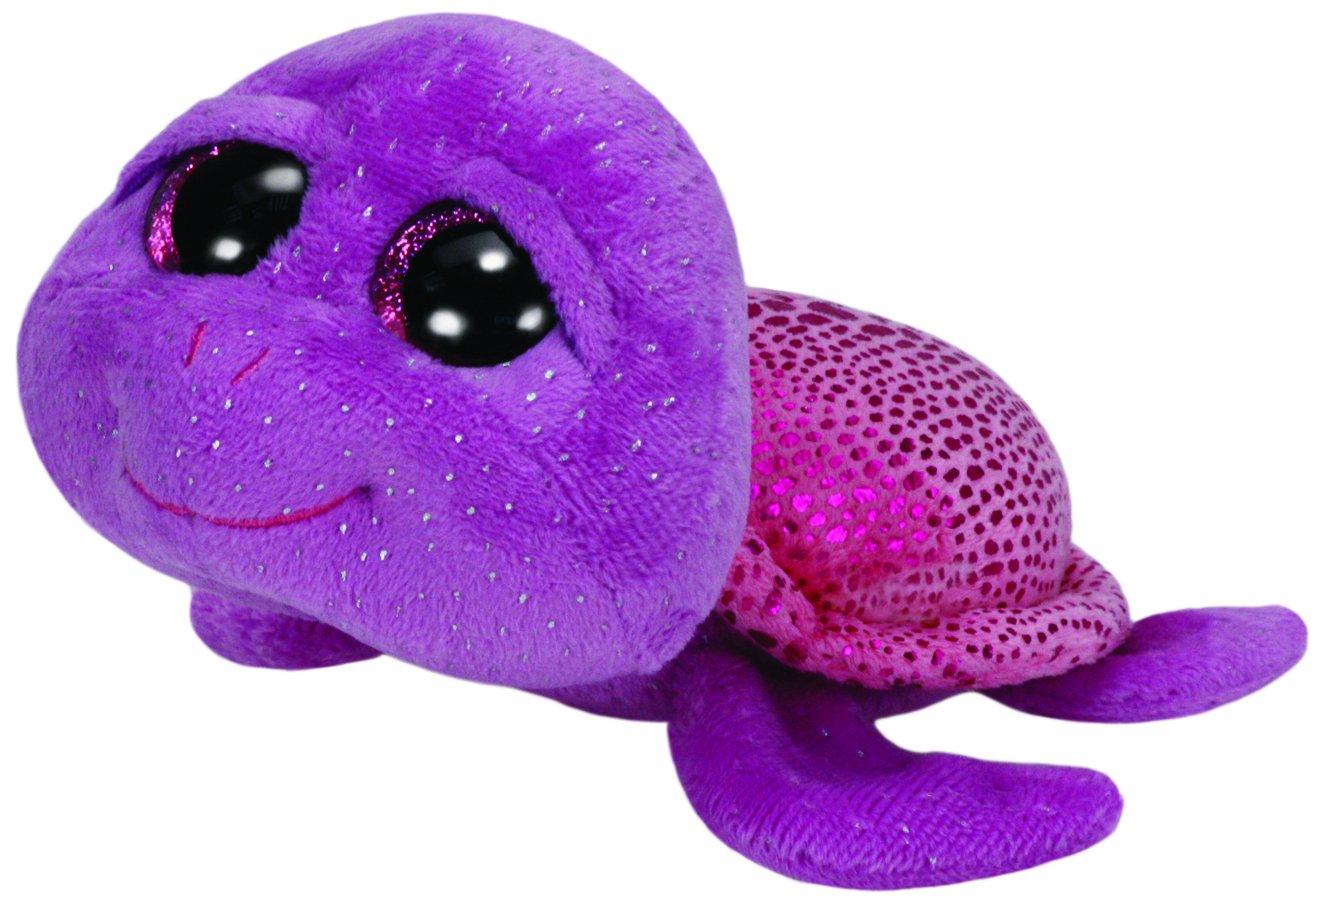 Ty - Slowpoke, peluche tortuga, 23 cm, color lila (37000TY)